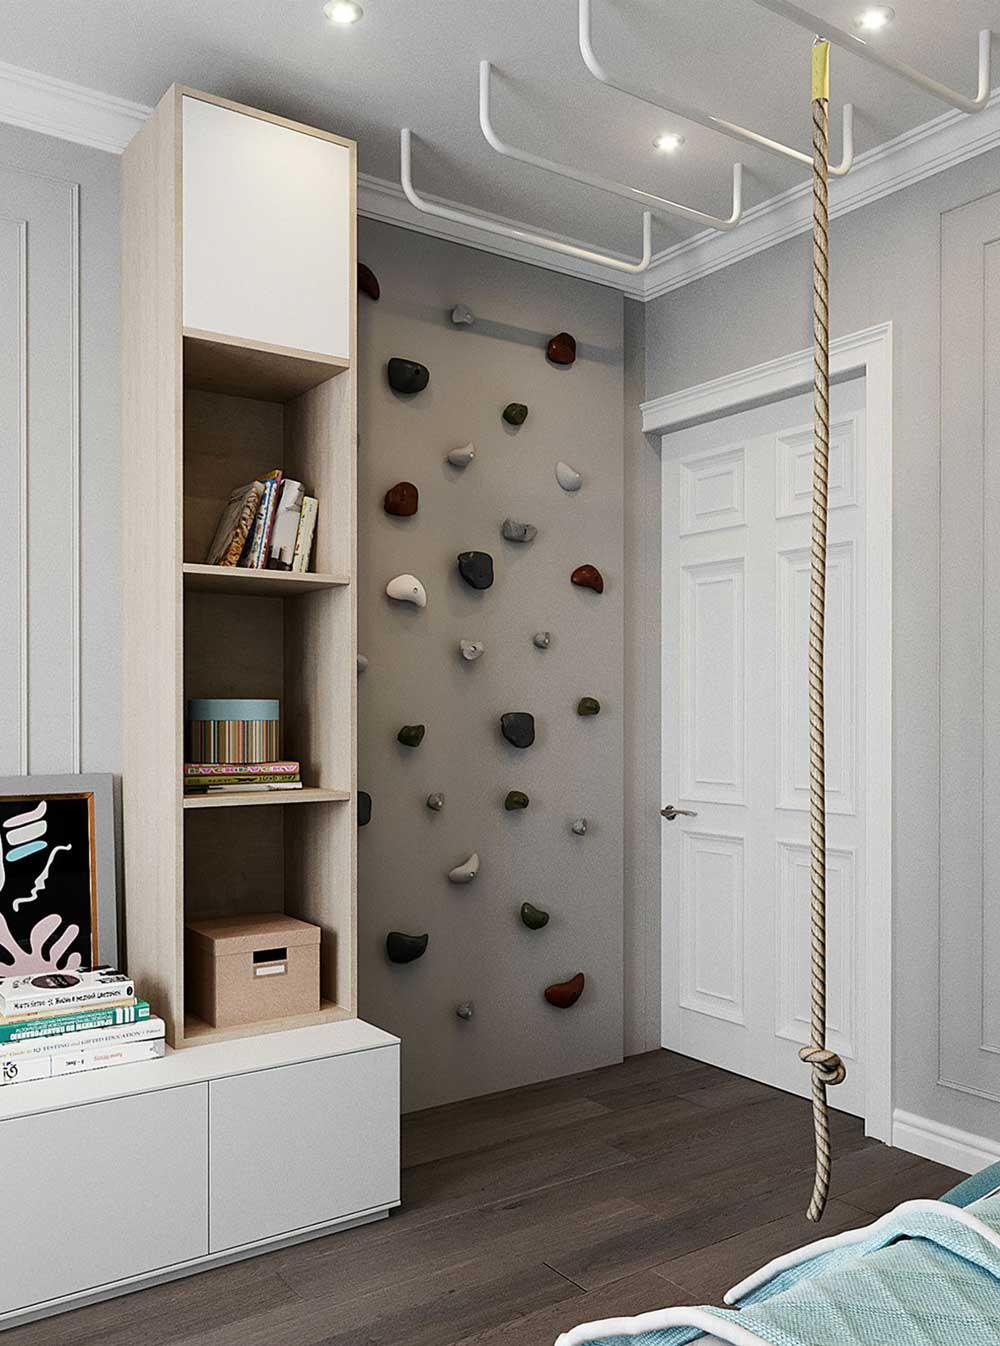 Kids-Bedroom-Ideas - Climbing-wall-fun